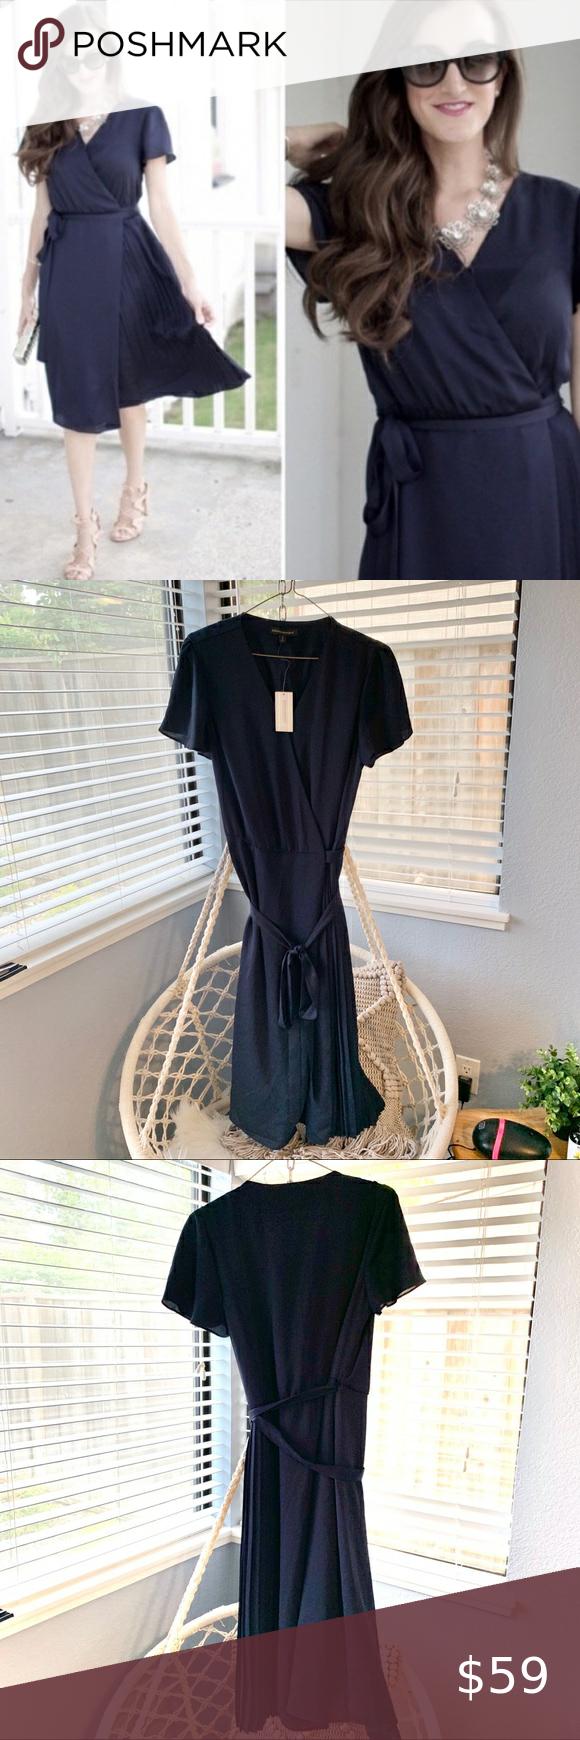 Nwt Banana Republic Pleated Wrap Dress Tall Lace Up Back Dress Professional Dresses Swing Tunic Dress [ 1740 x 580 Pixel ]